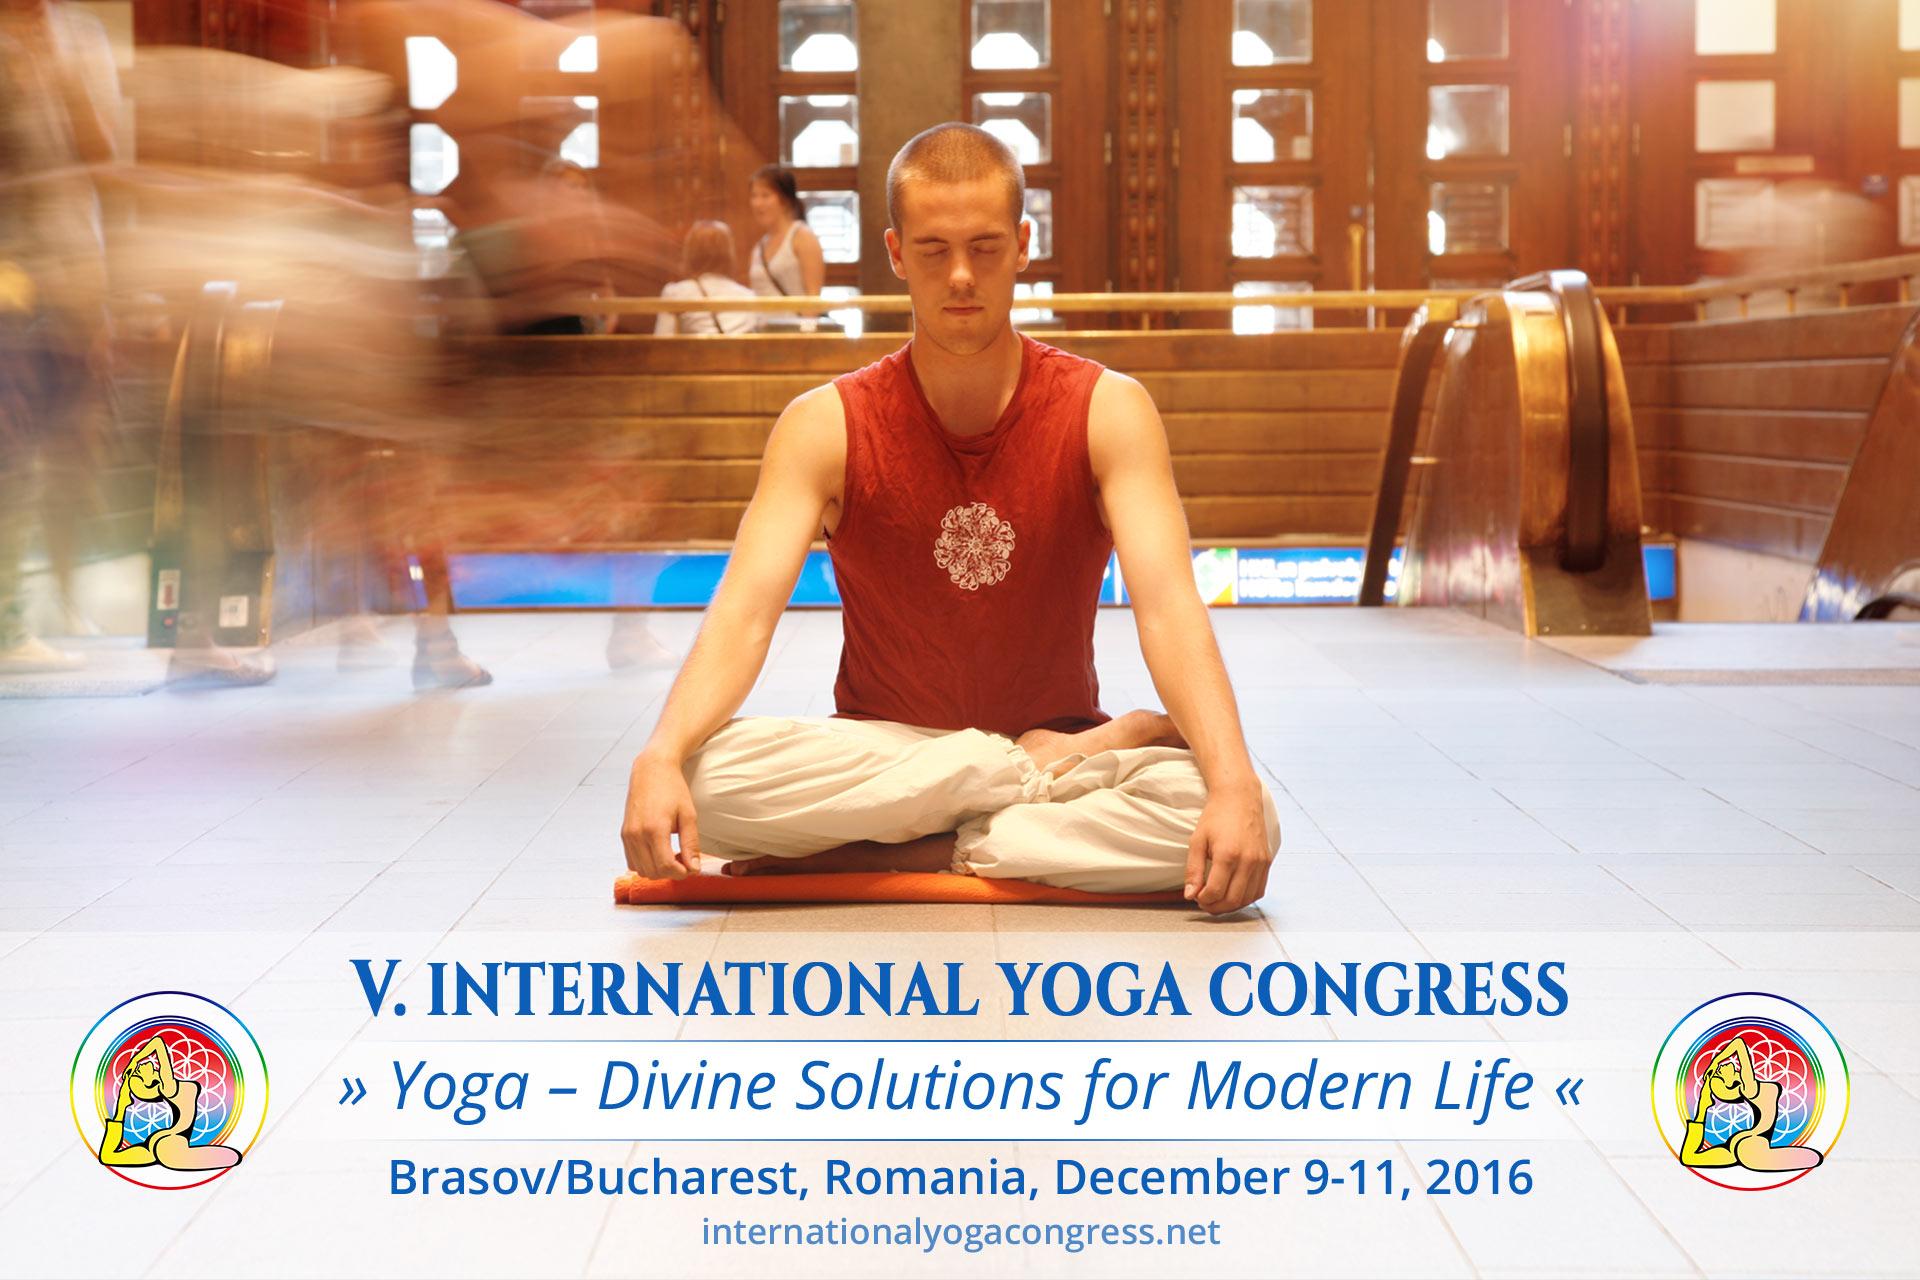 yoga-congress-2016-banner-01